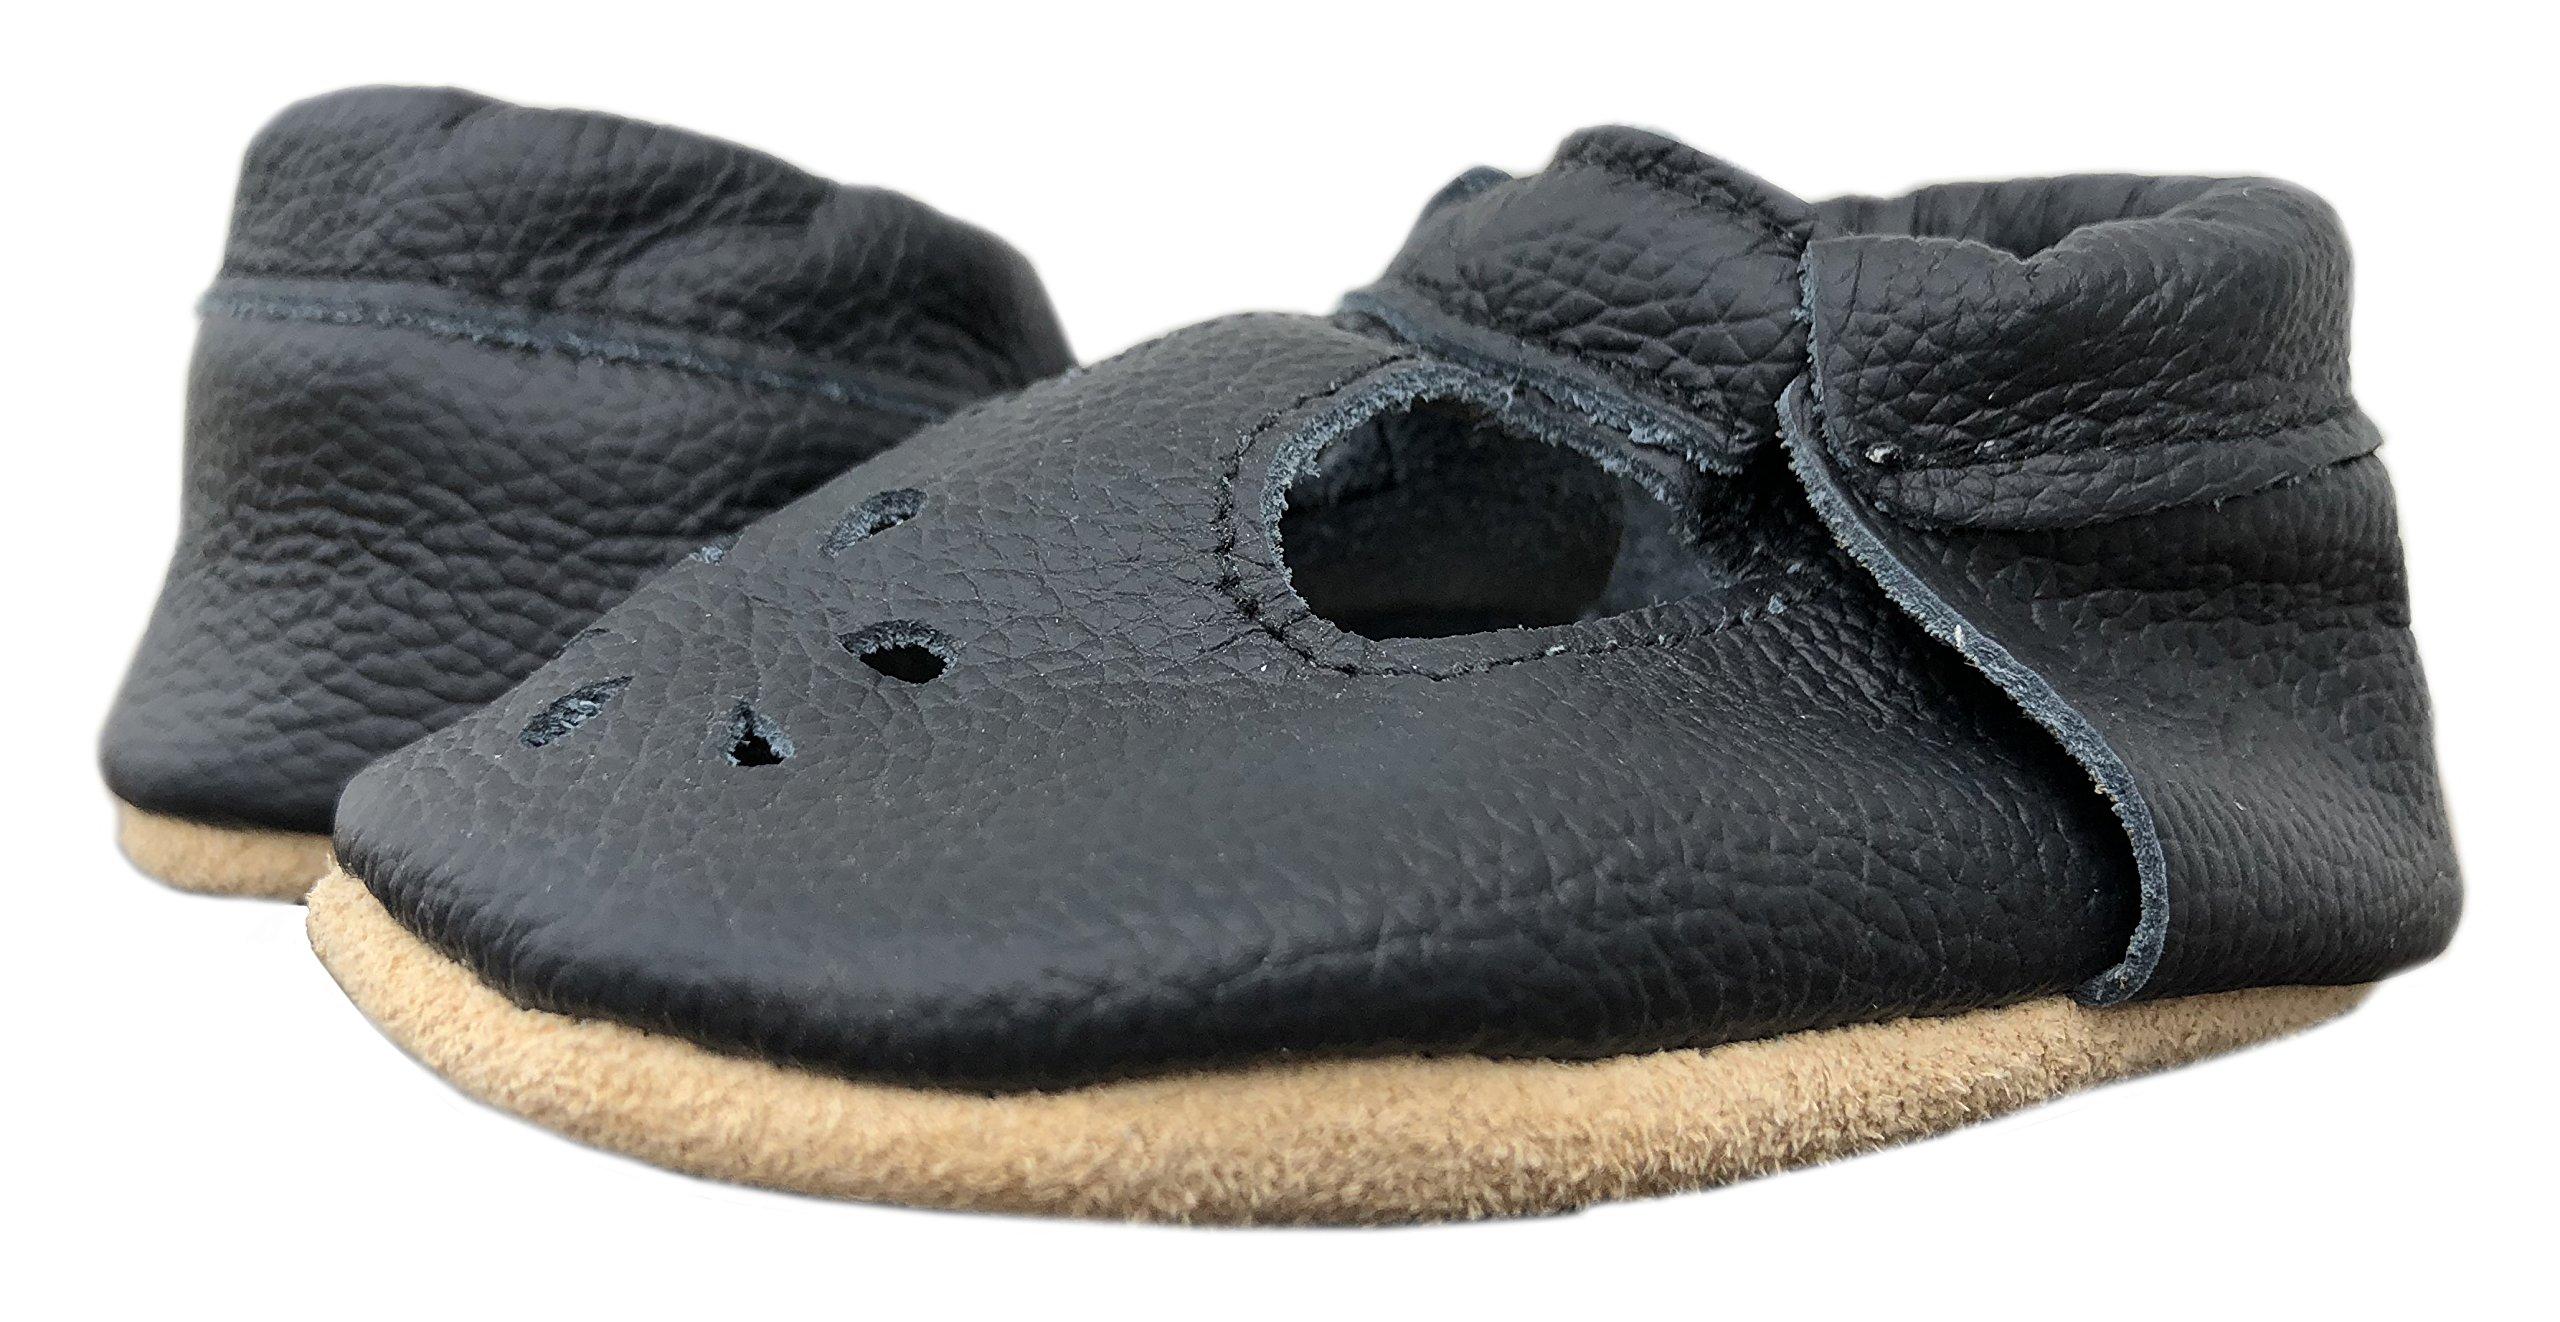 Lucky Love Baby & Toddler Soft Sole Prewalker Skid Resistant Boys & Girls Shoes (12-18 Months, T-Strap Black)